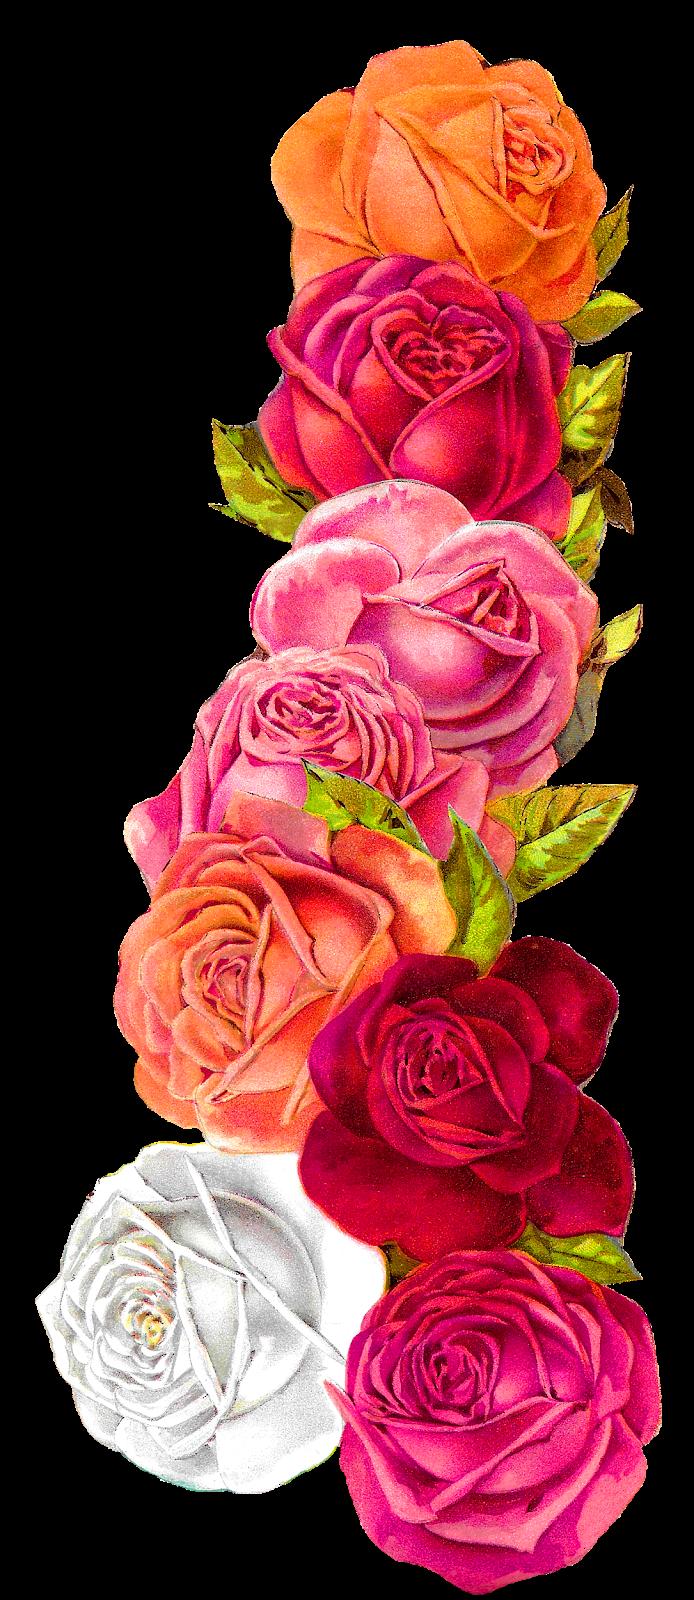 Antique Images: Romantic Vintage Rose Shabby Chic Wedding Floral ...